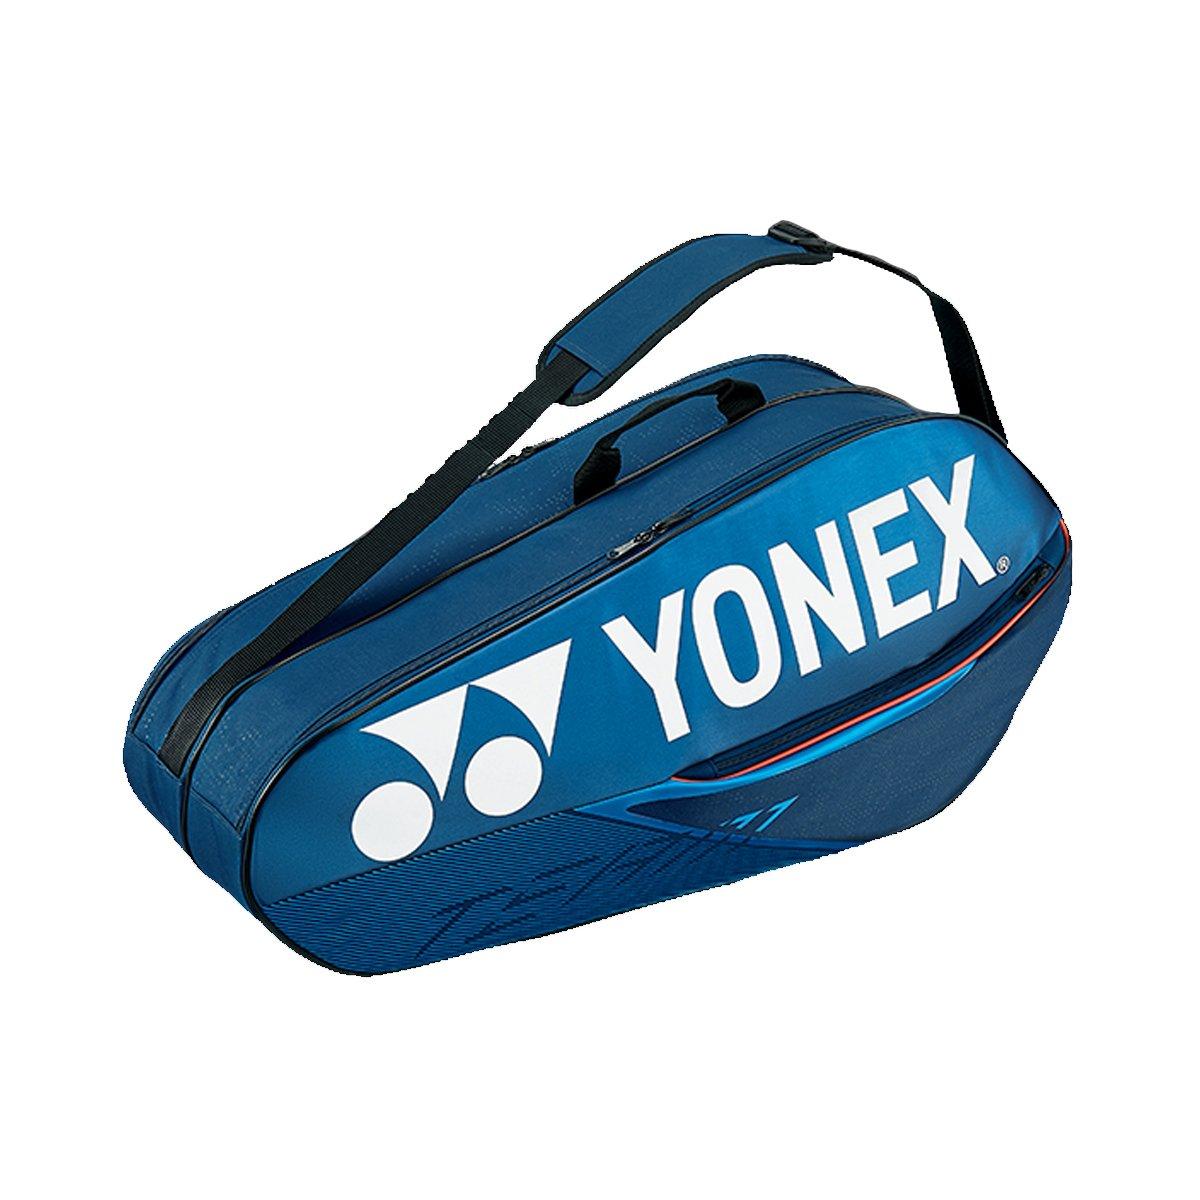 Raqueteira Yonex Team X6 Azul 2021